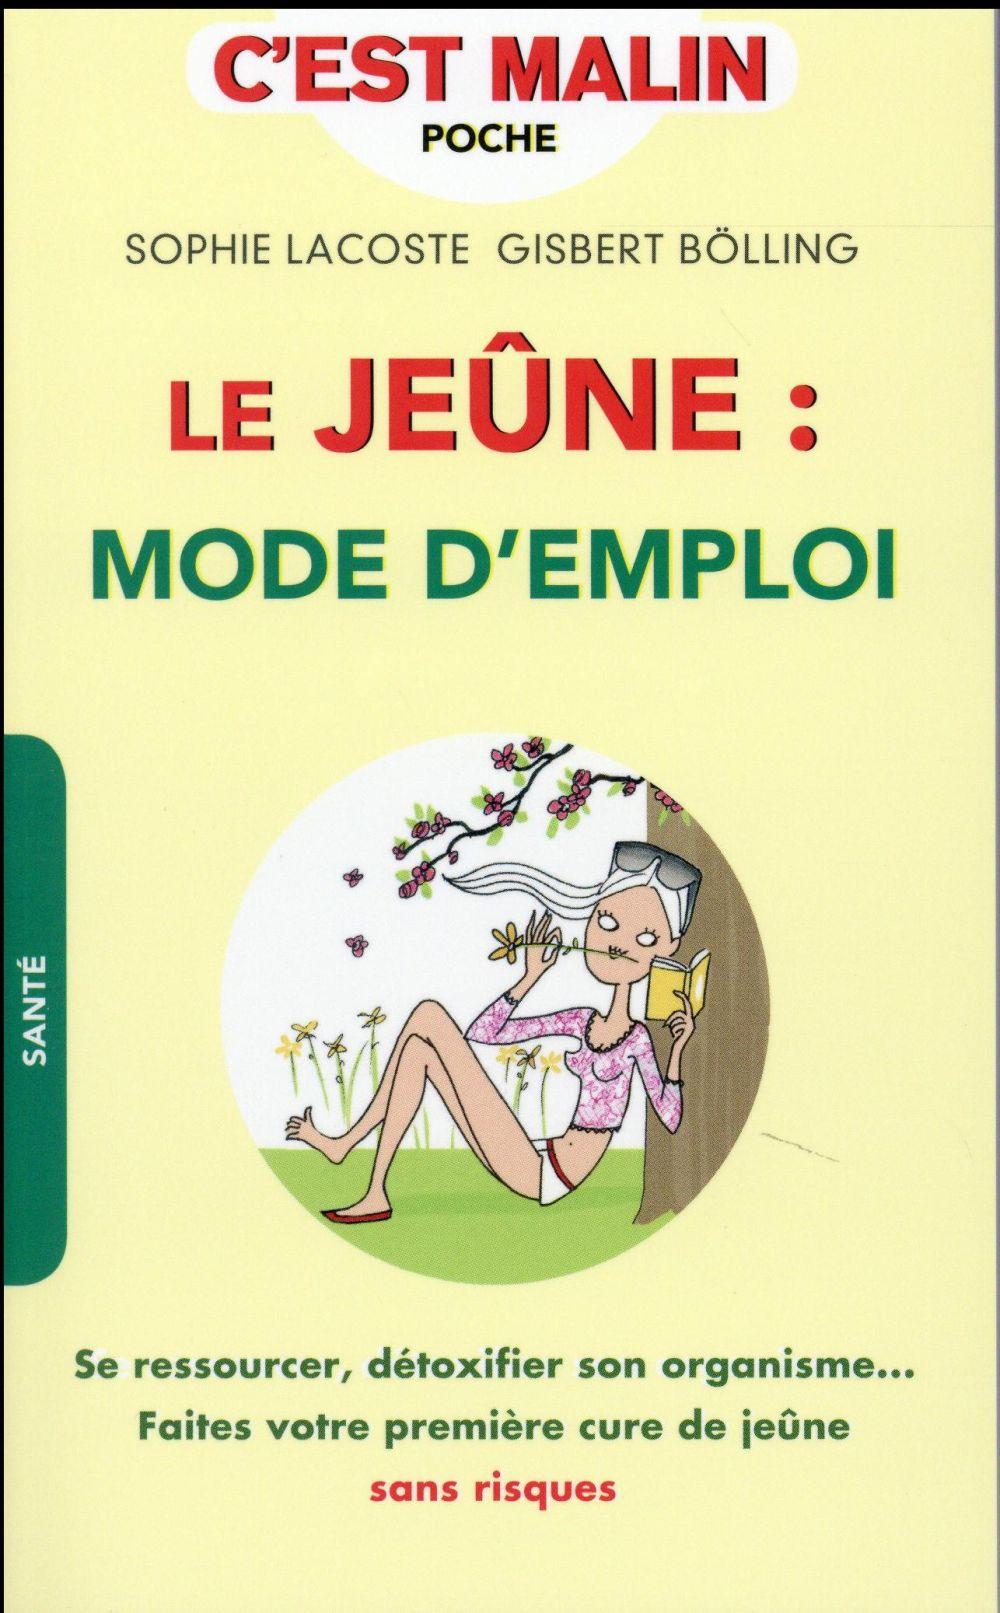 LE JEUNE : MODE D'EMPLOI, C'EST MALIN